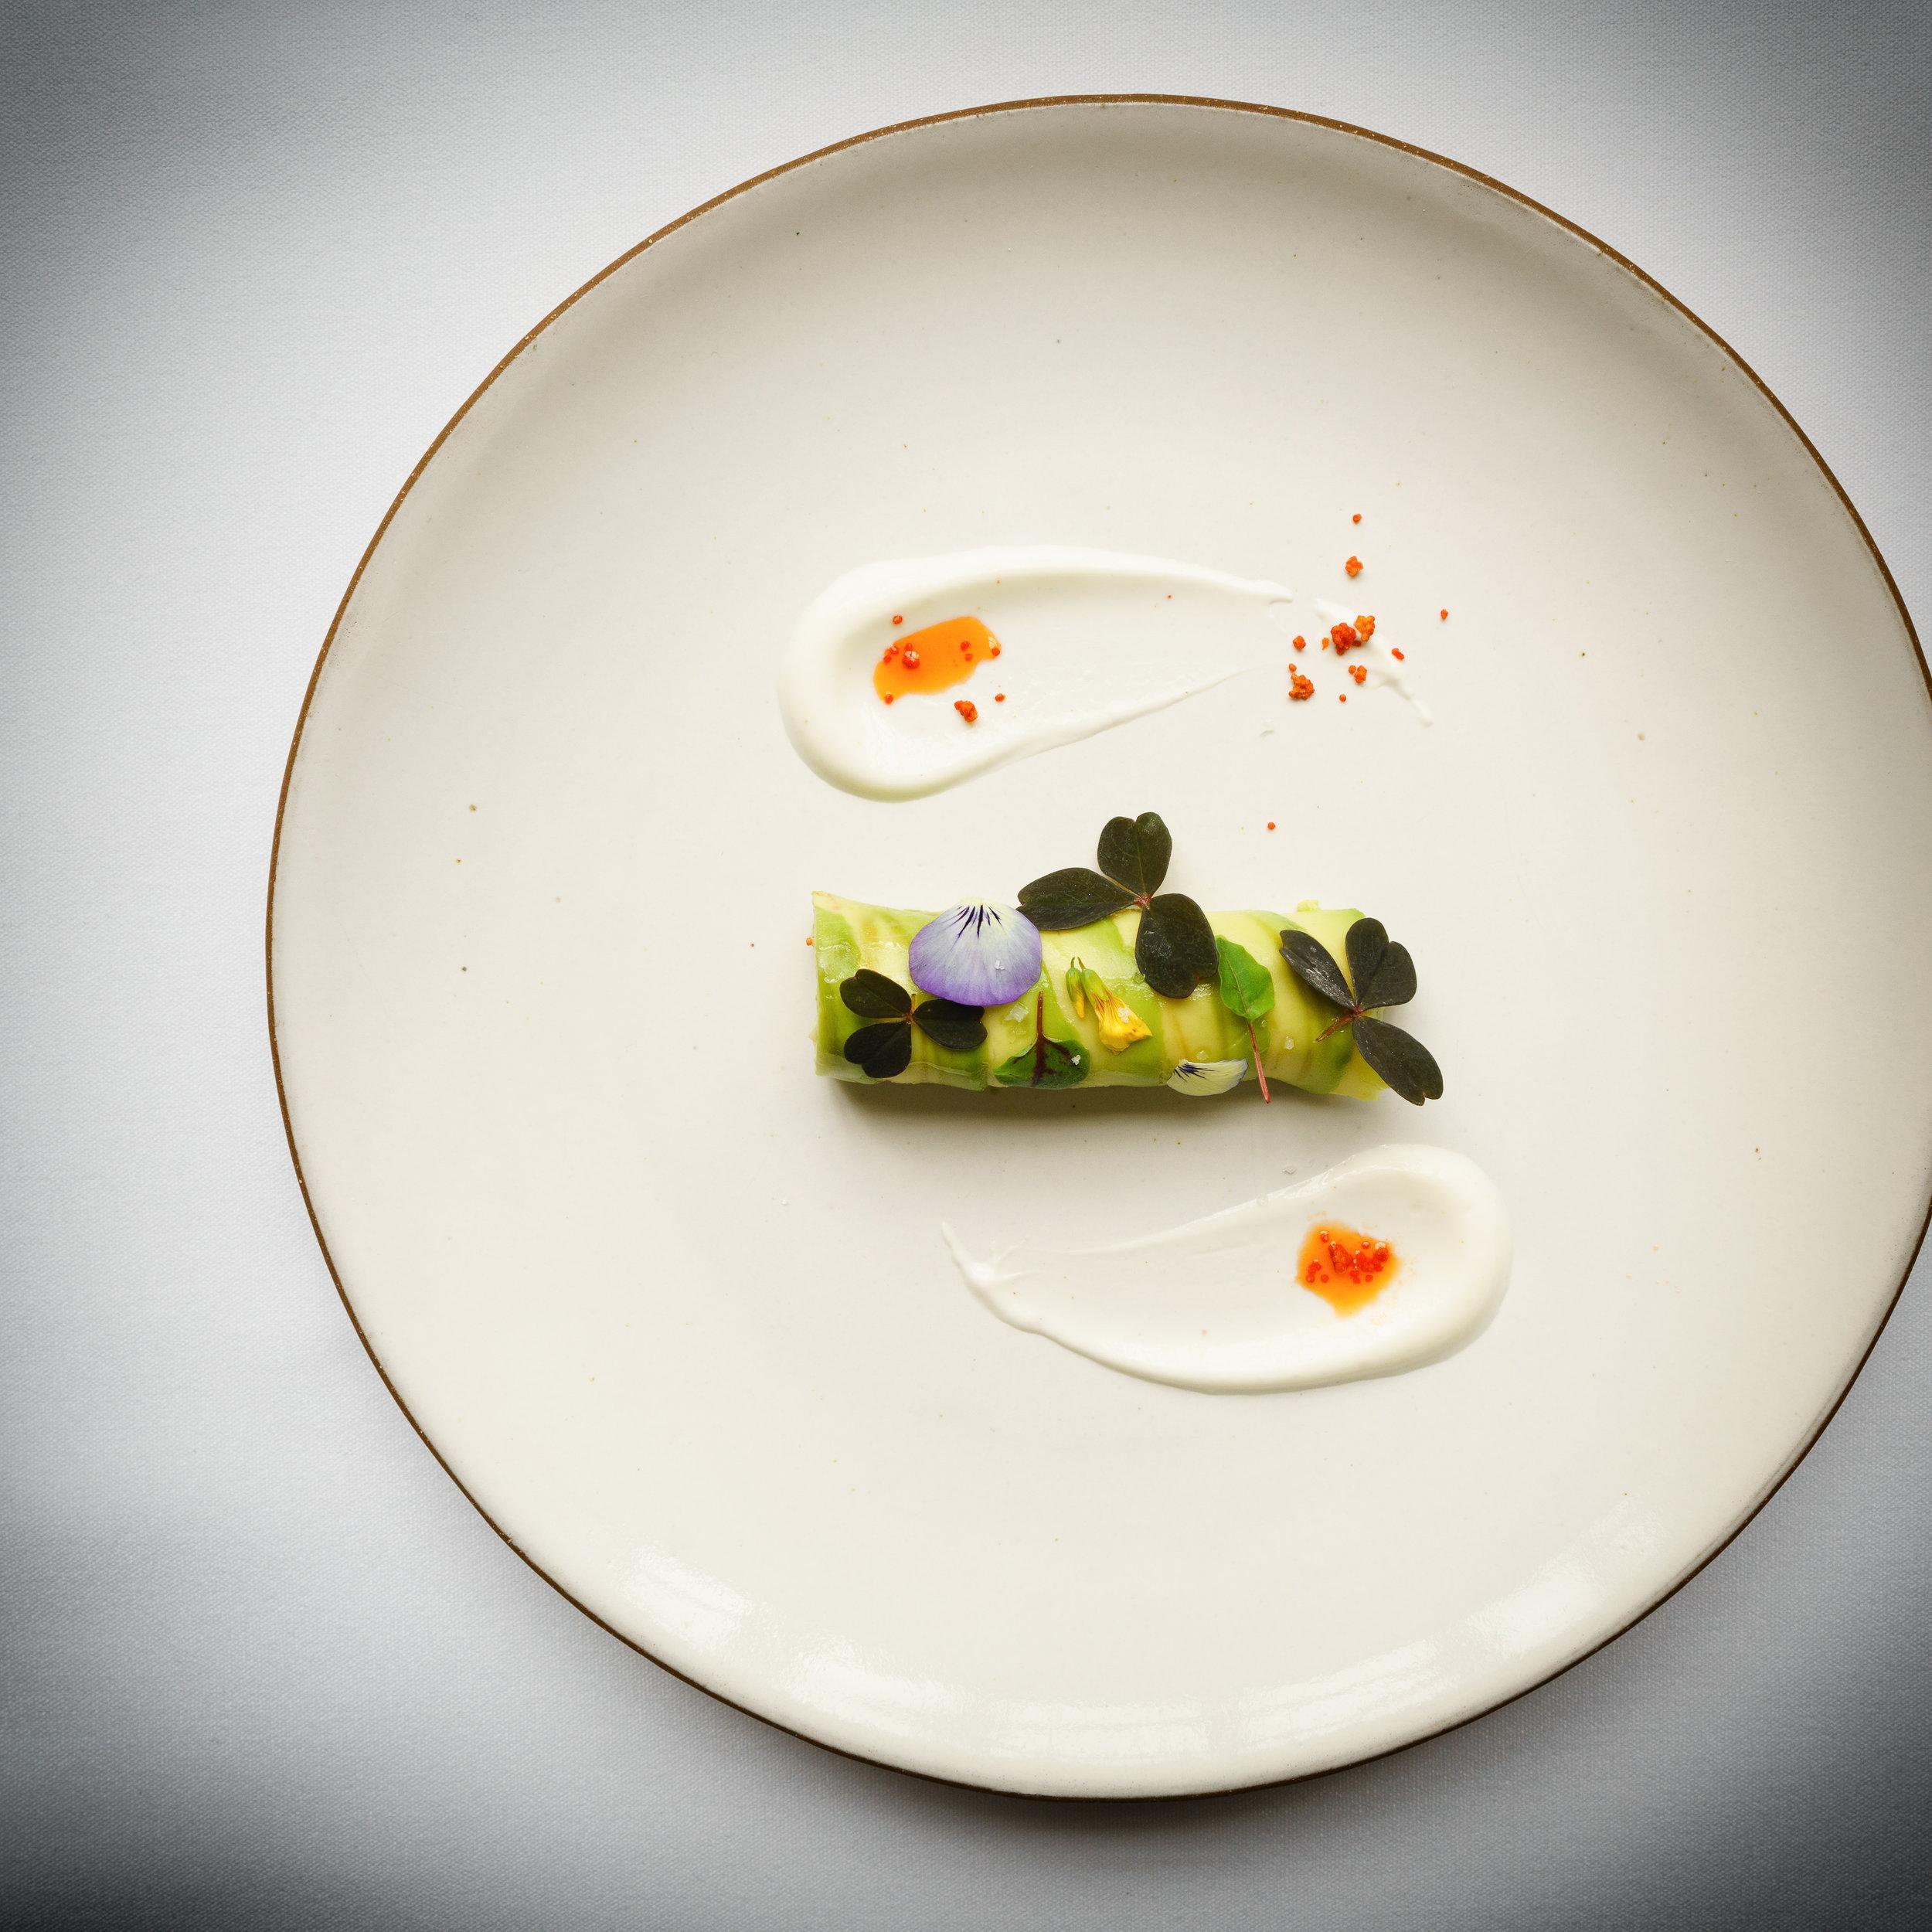 Prawn: Roulade with avocado and yogurt (2007)